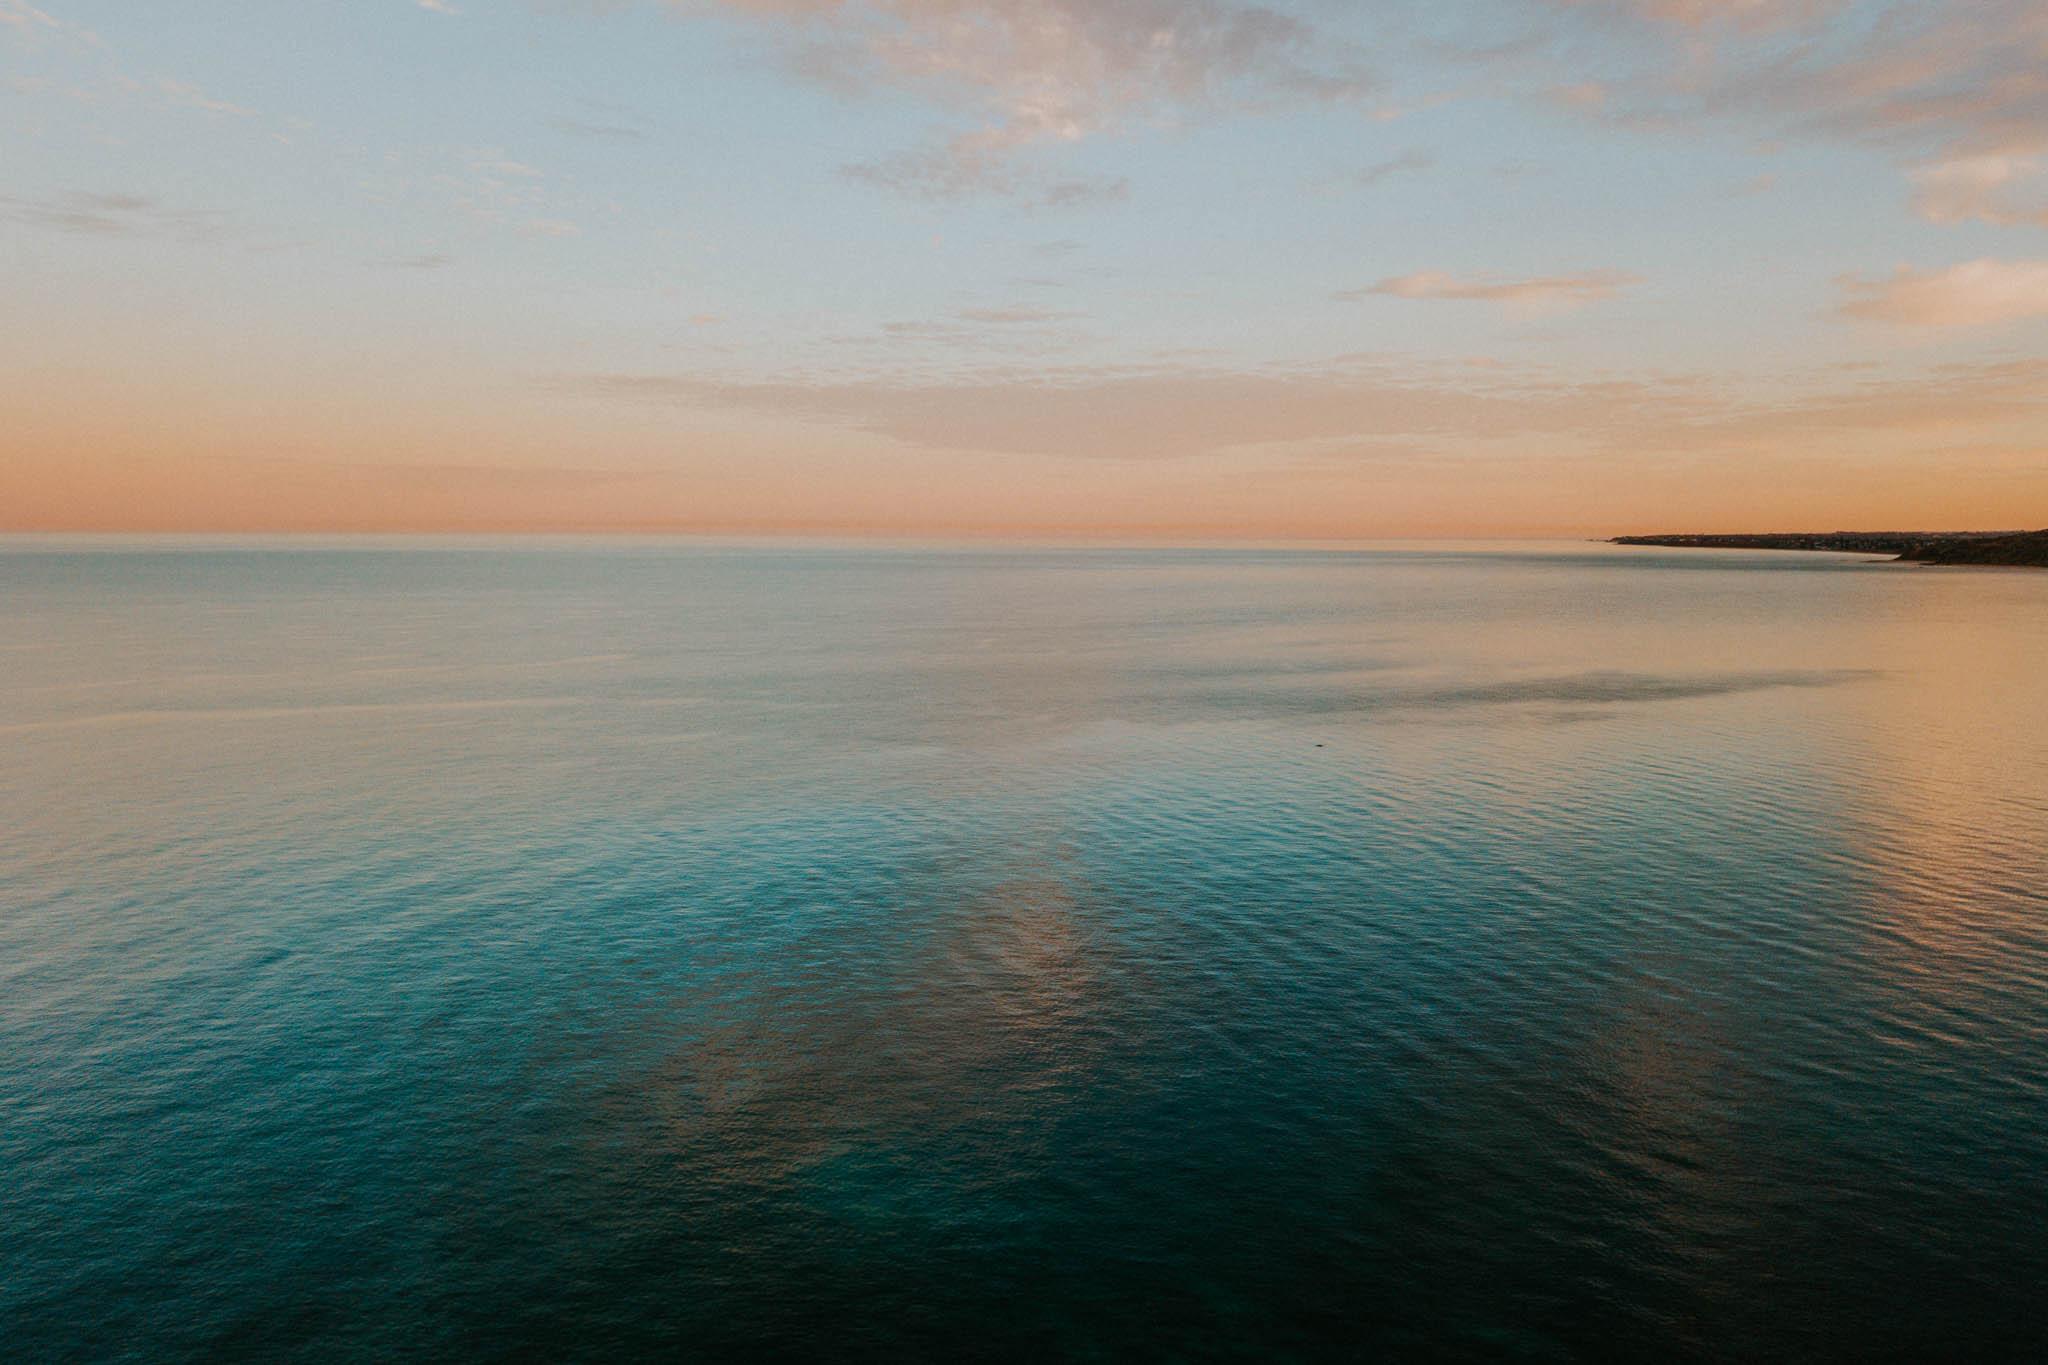 drone-ocean-sunset-benjamin-andrew.jpg